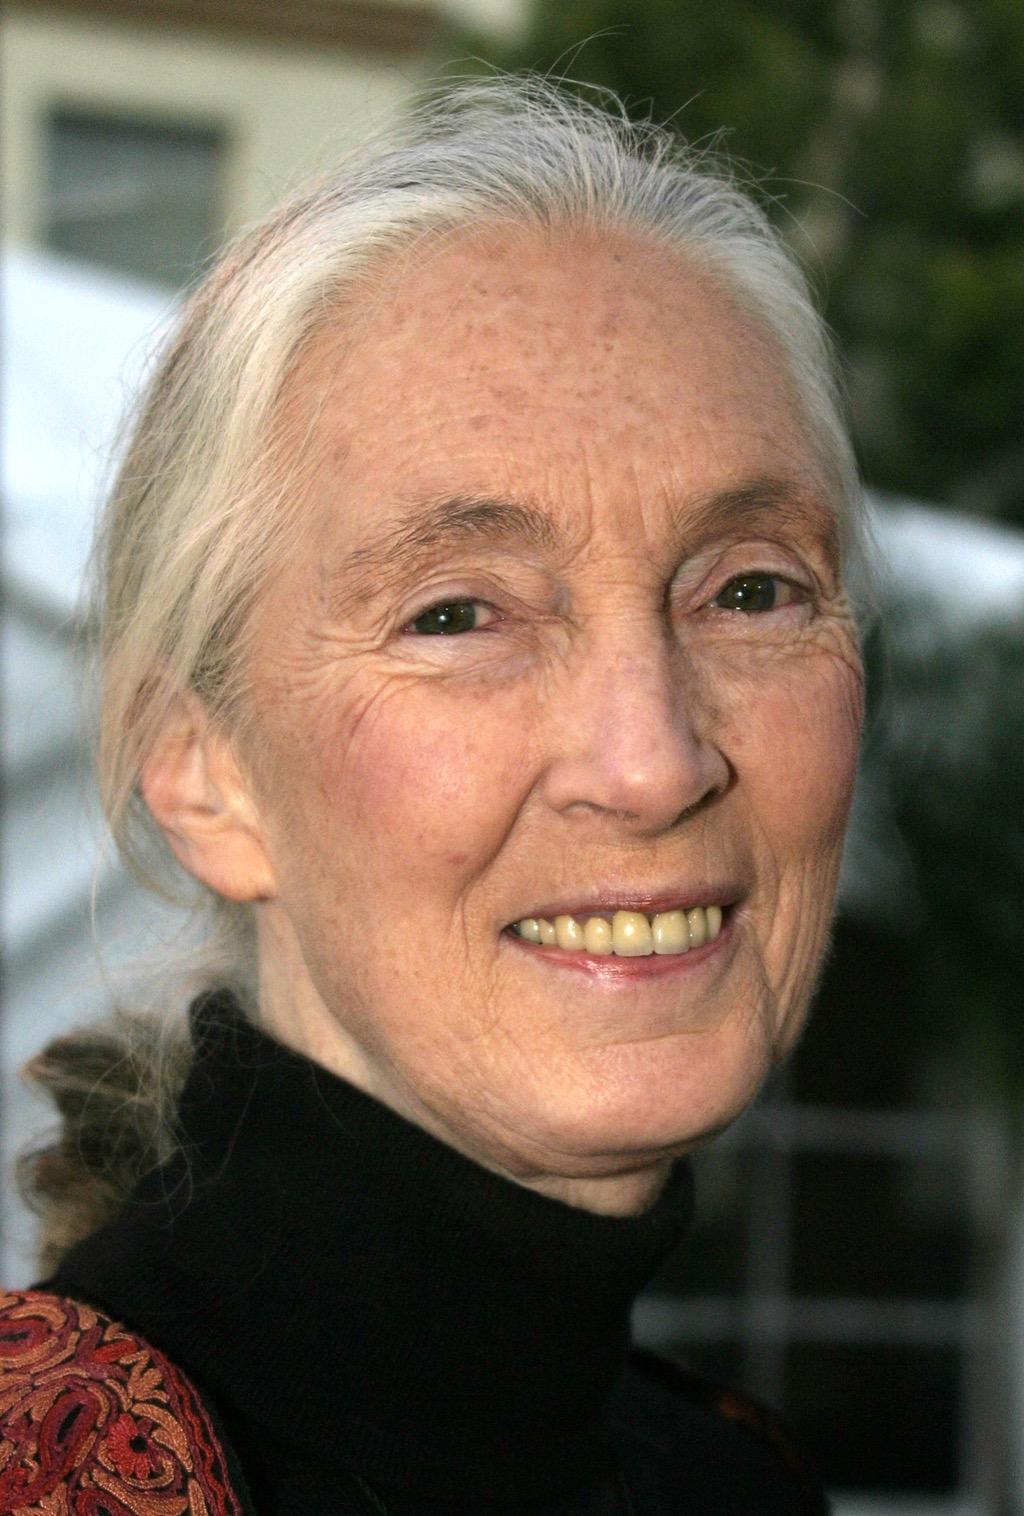 Jane Goodall, inspiring quotes